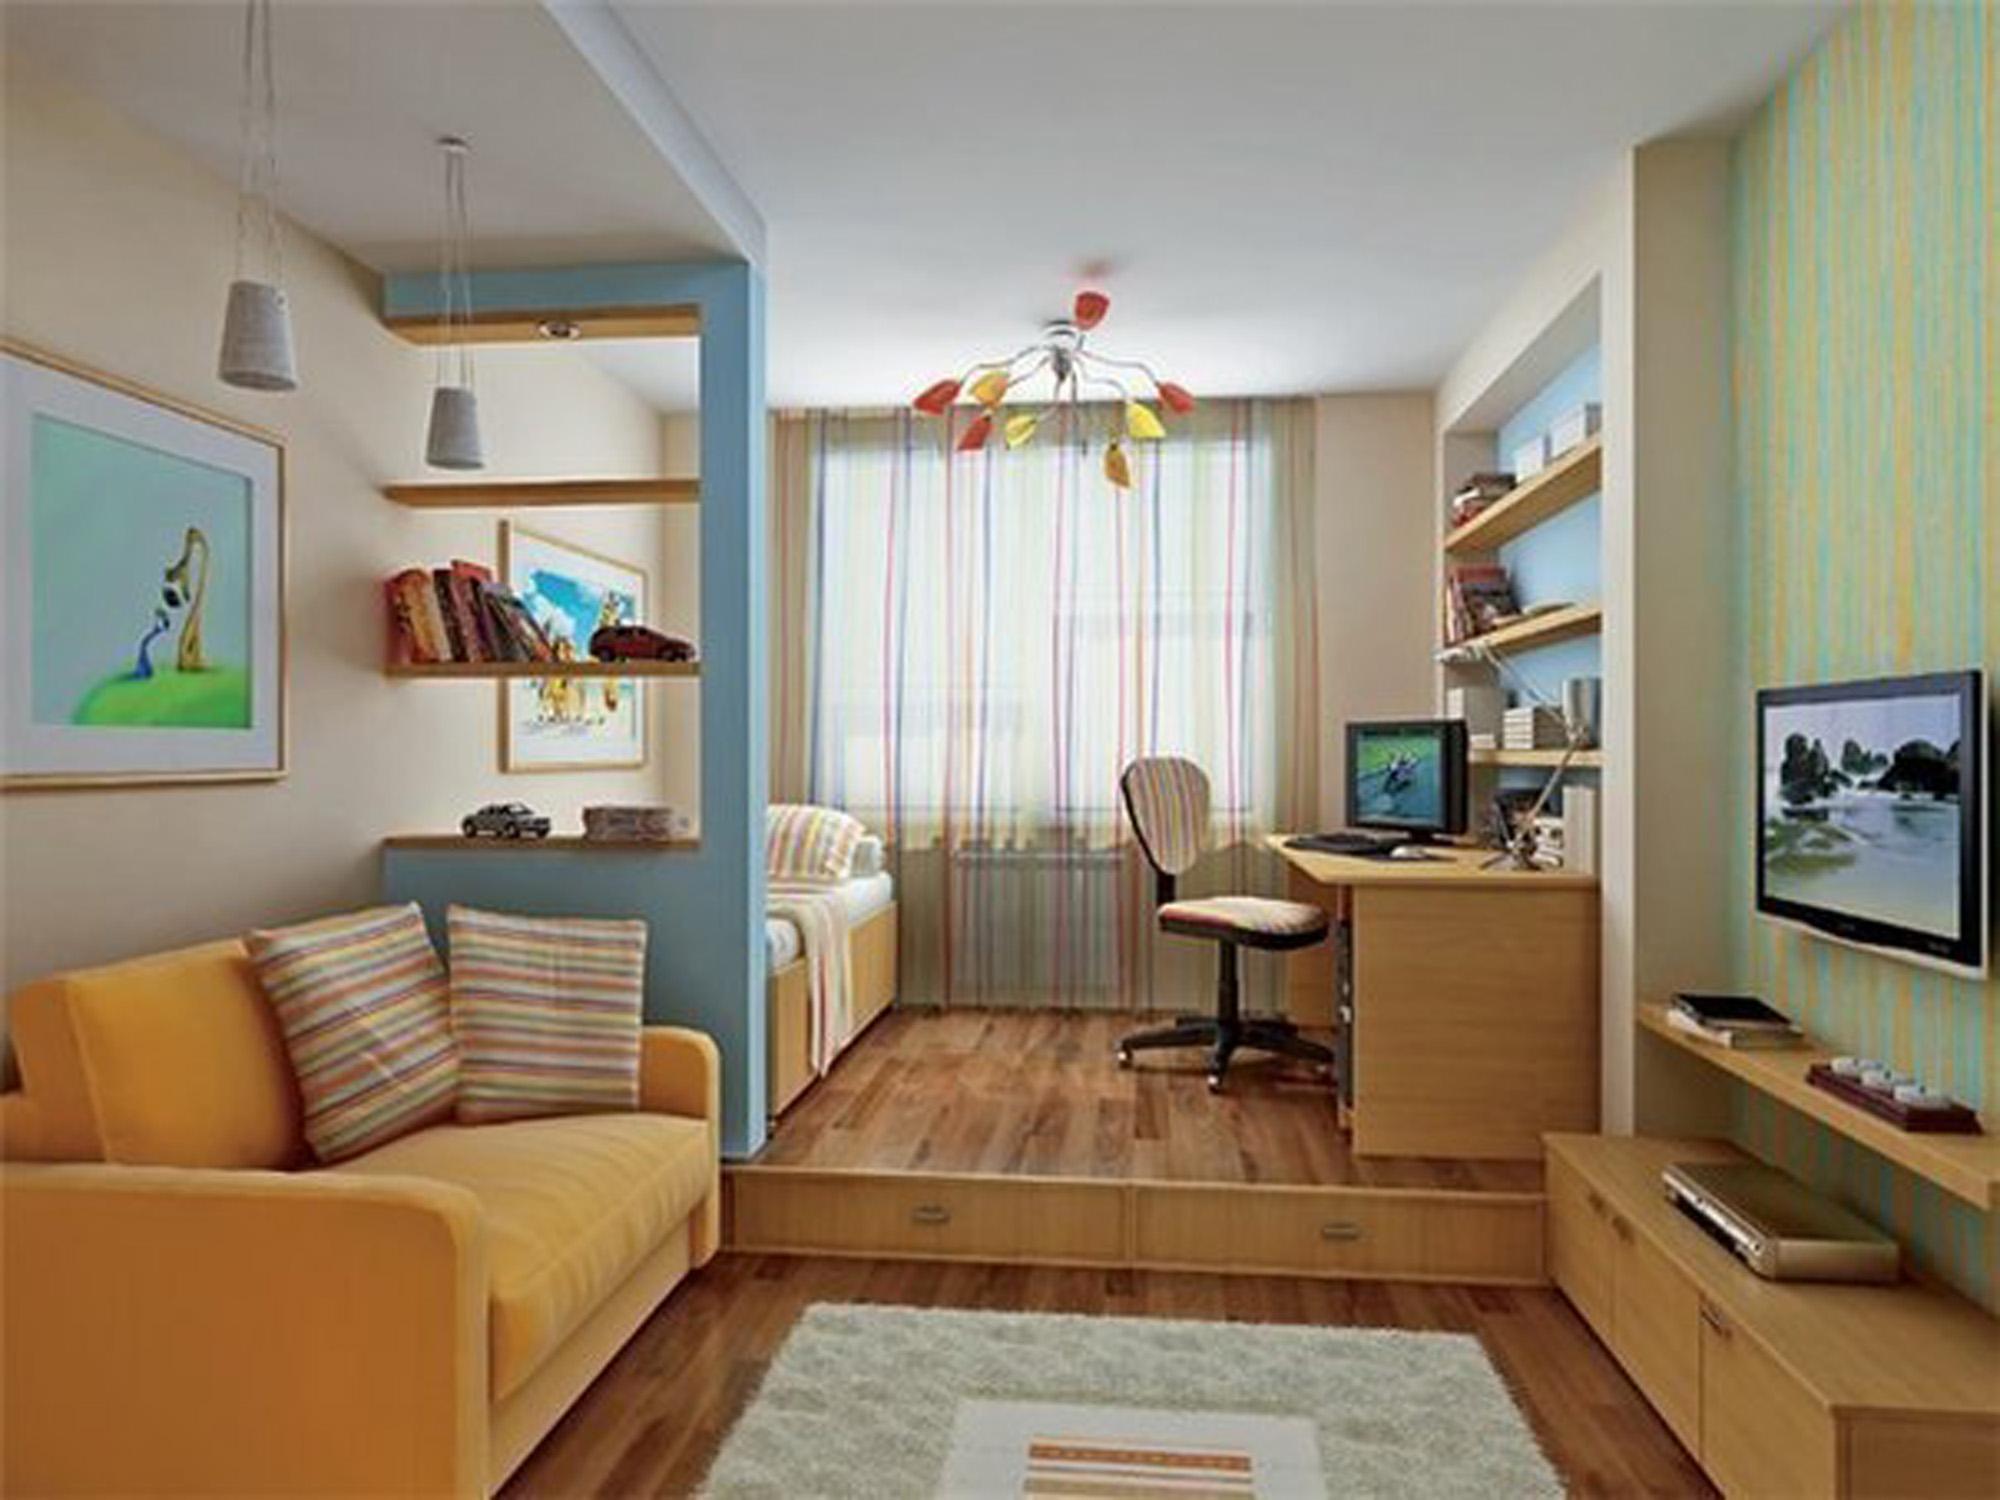 Дизайн одной комнатной квартире